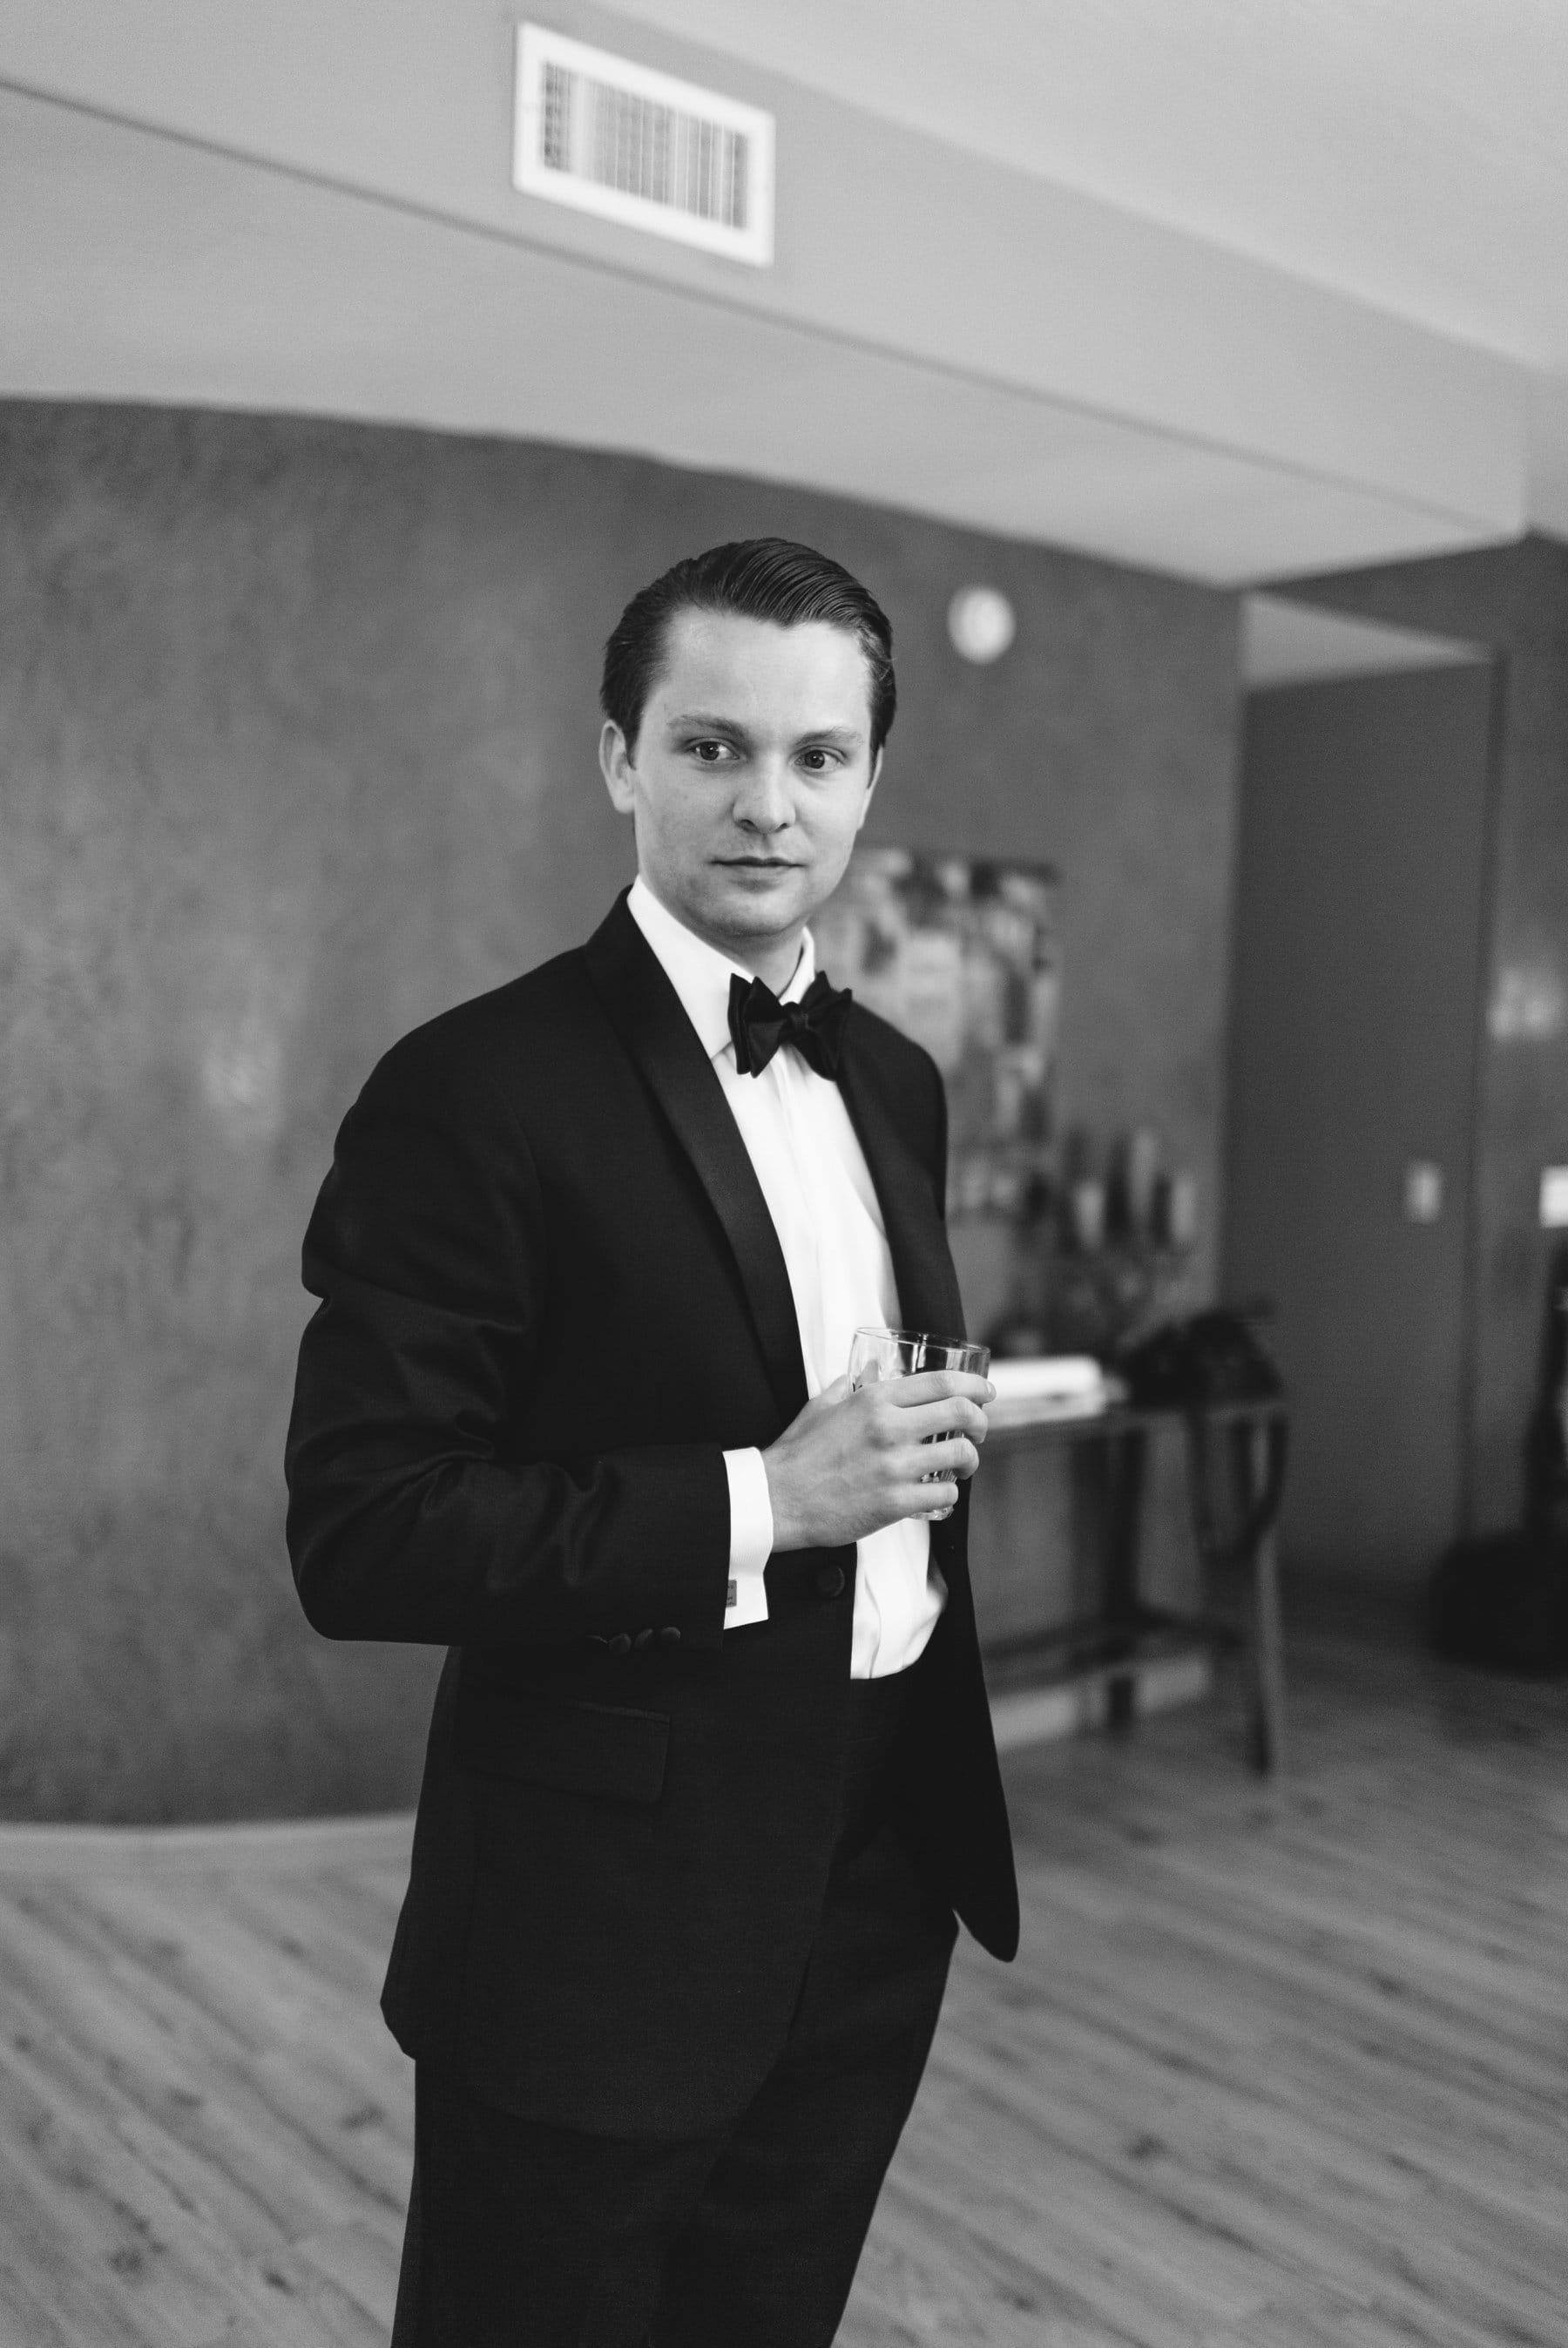 classy groom in tux holding drink Arizona wedding photos